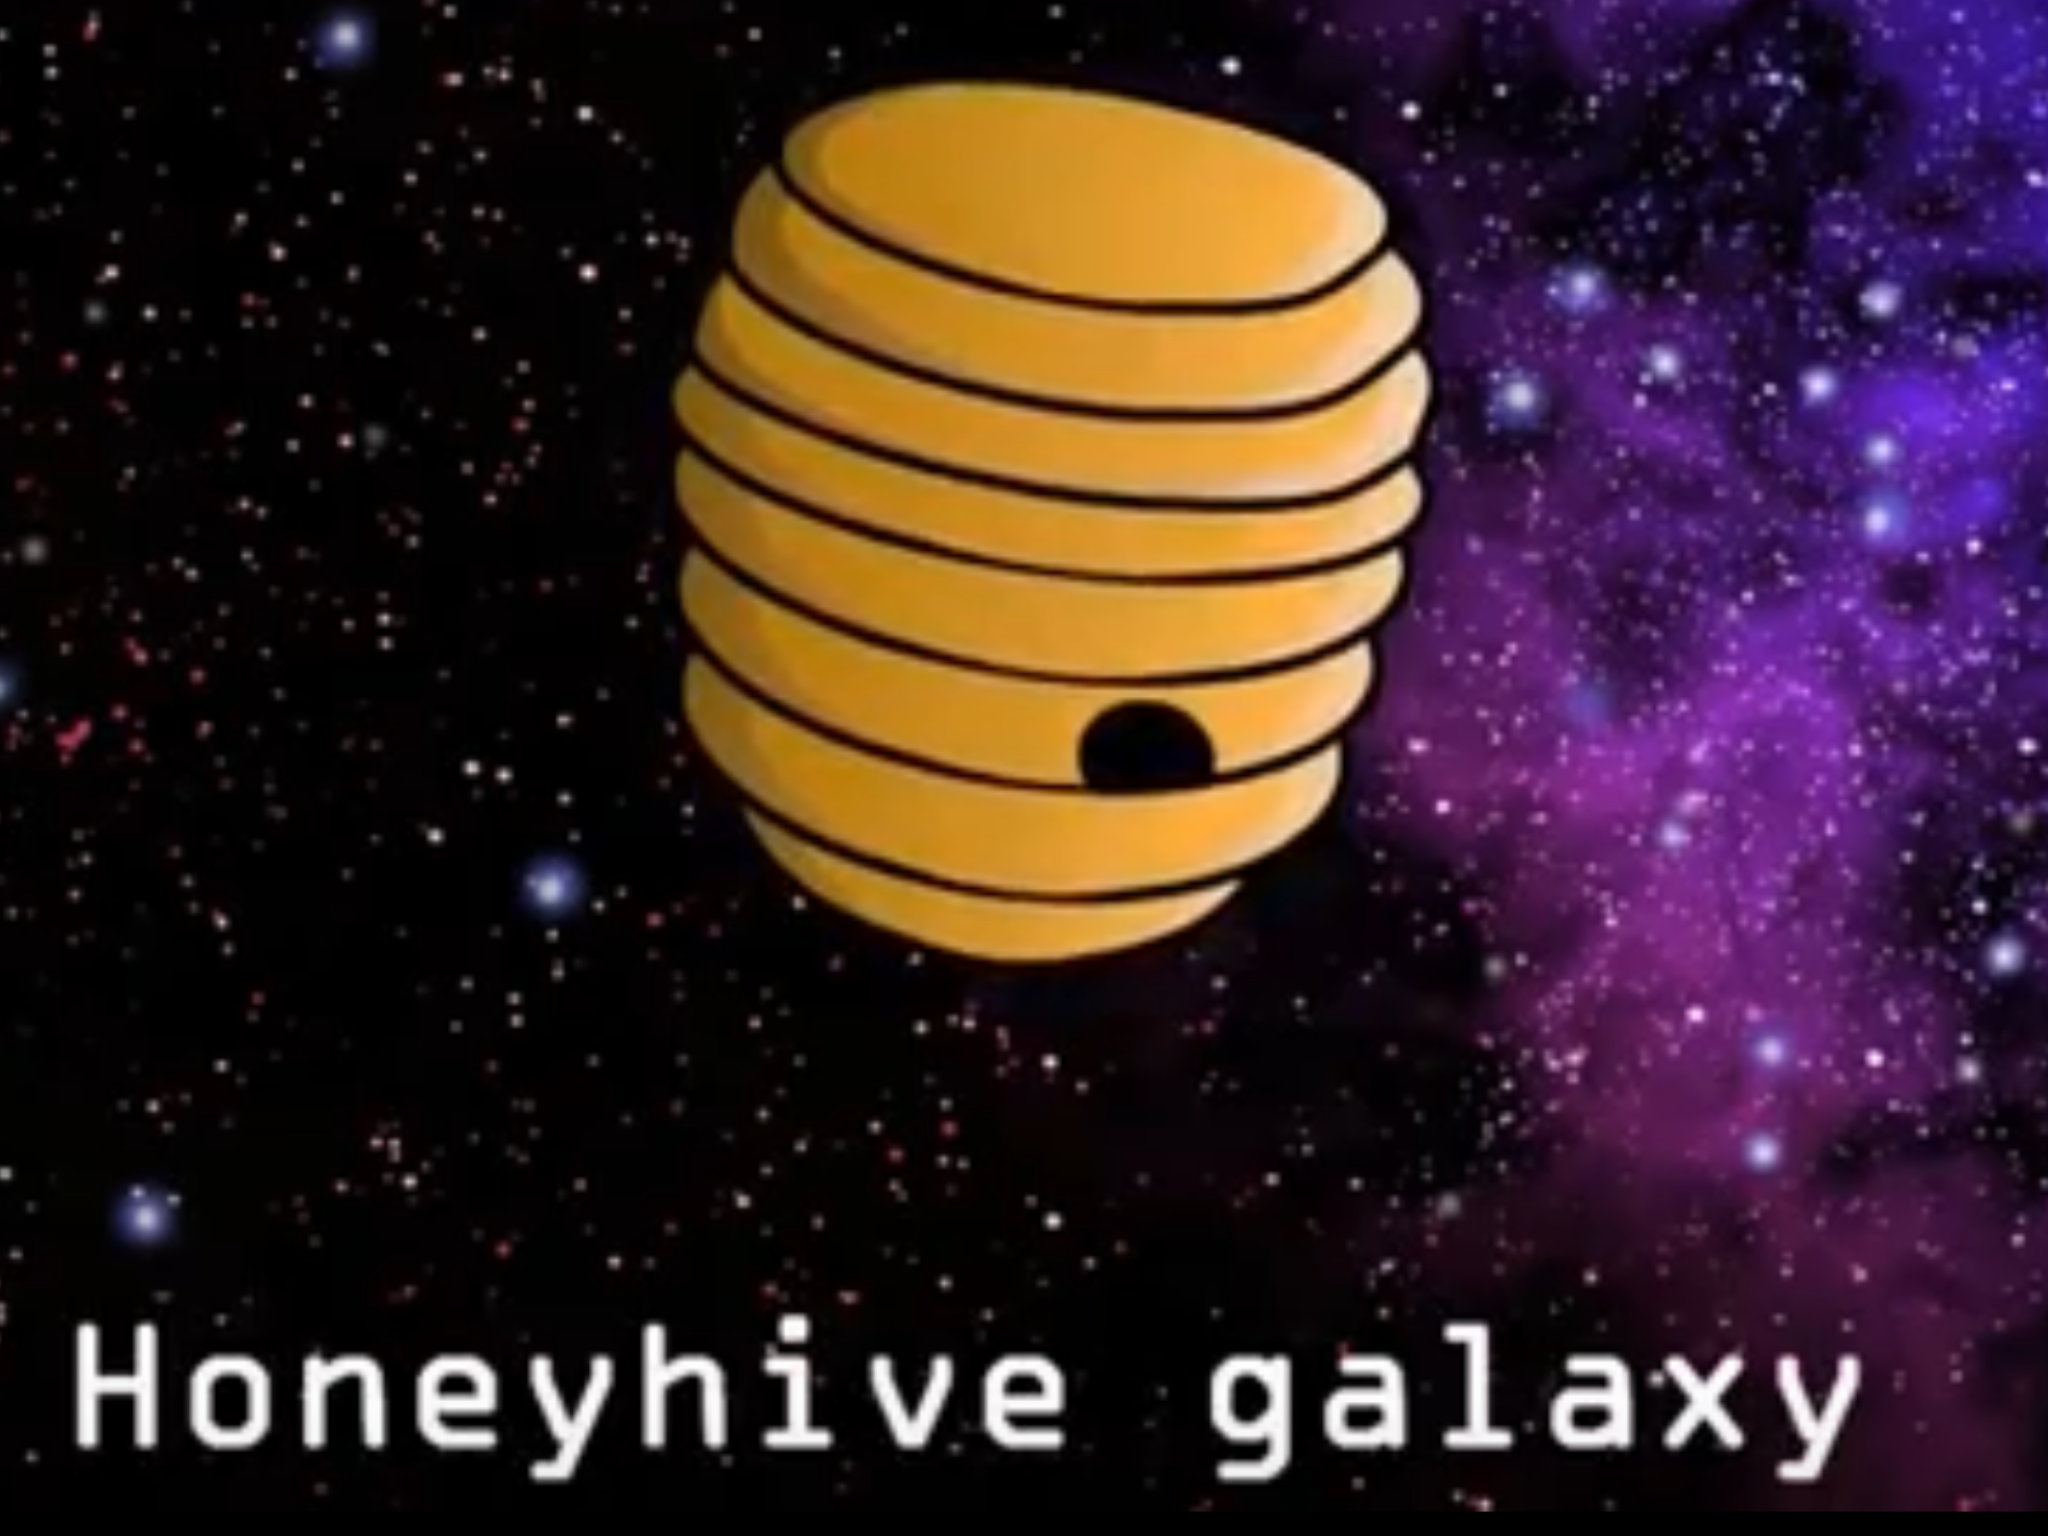 Honeyhive galaxy